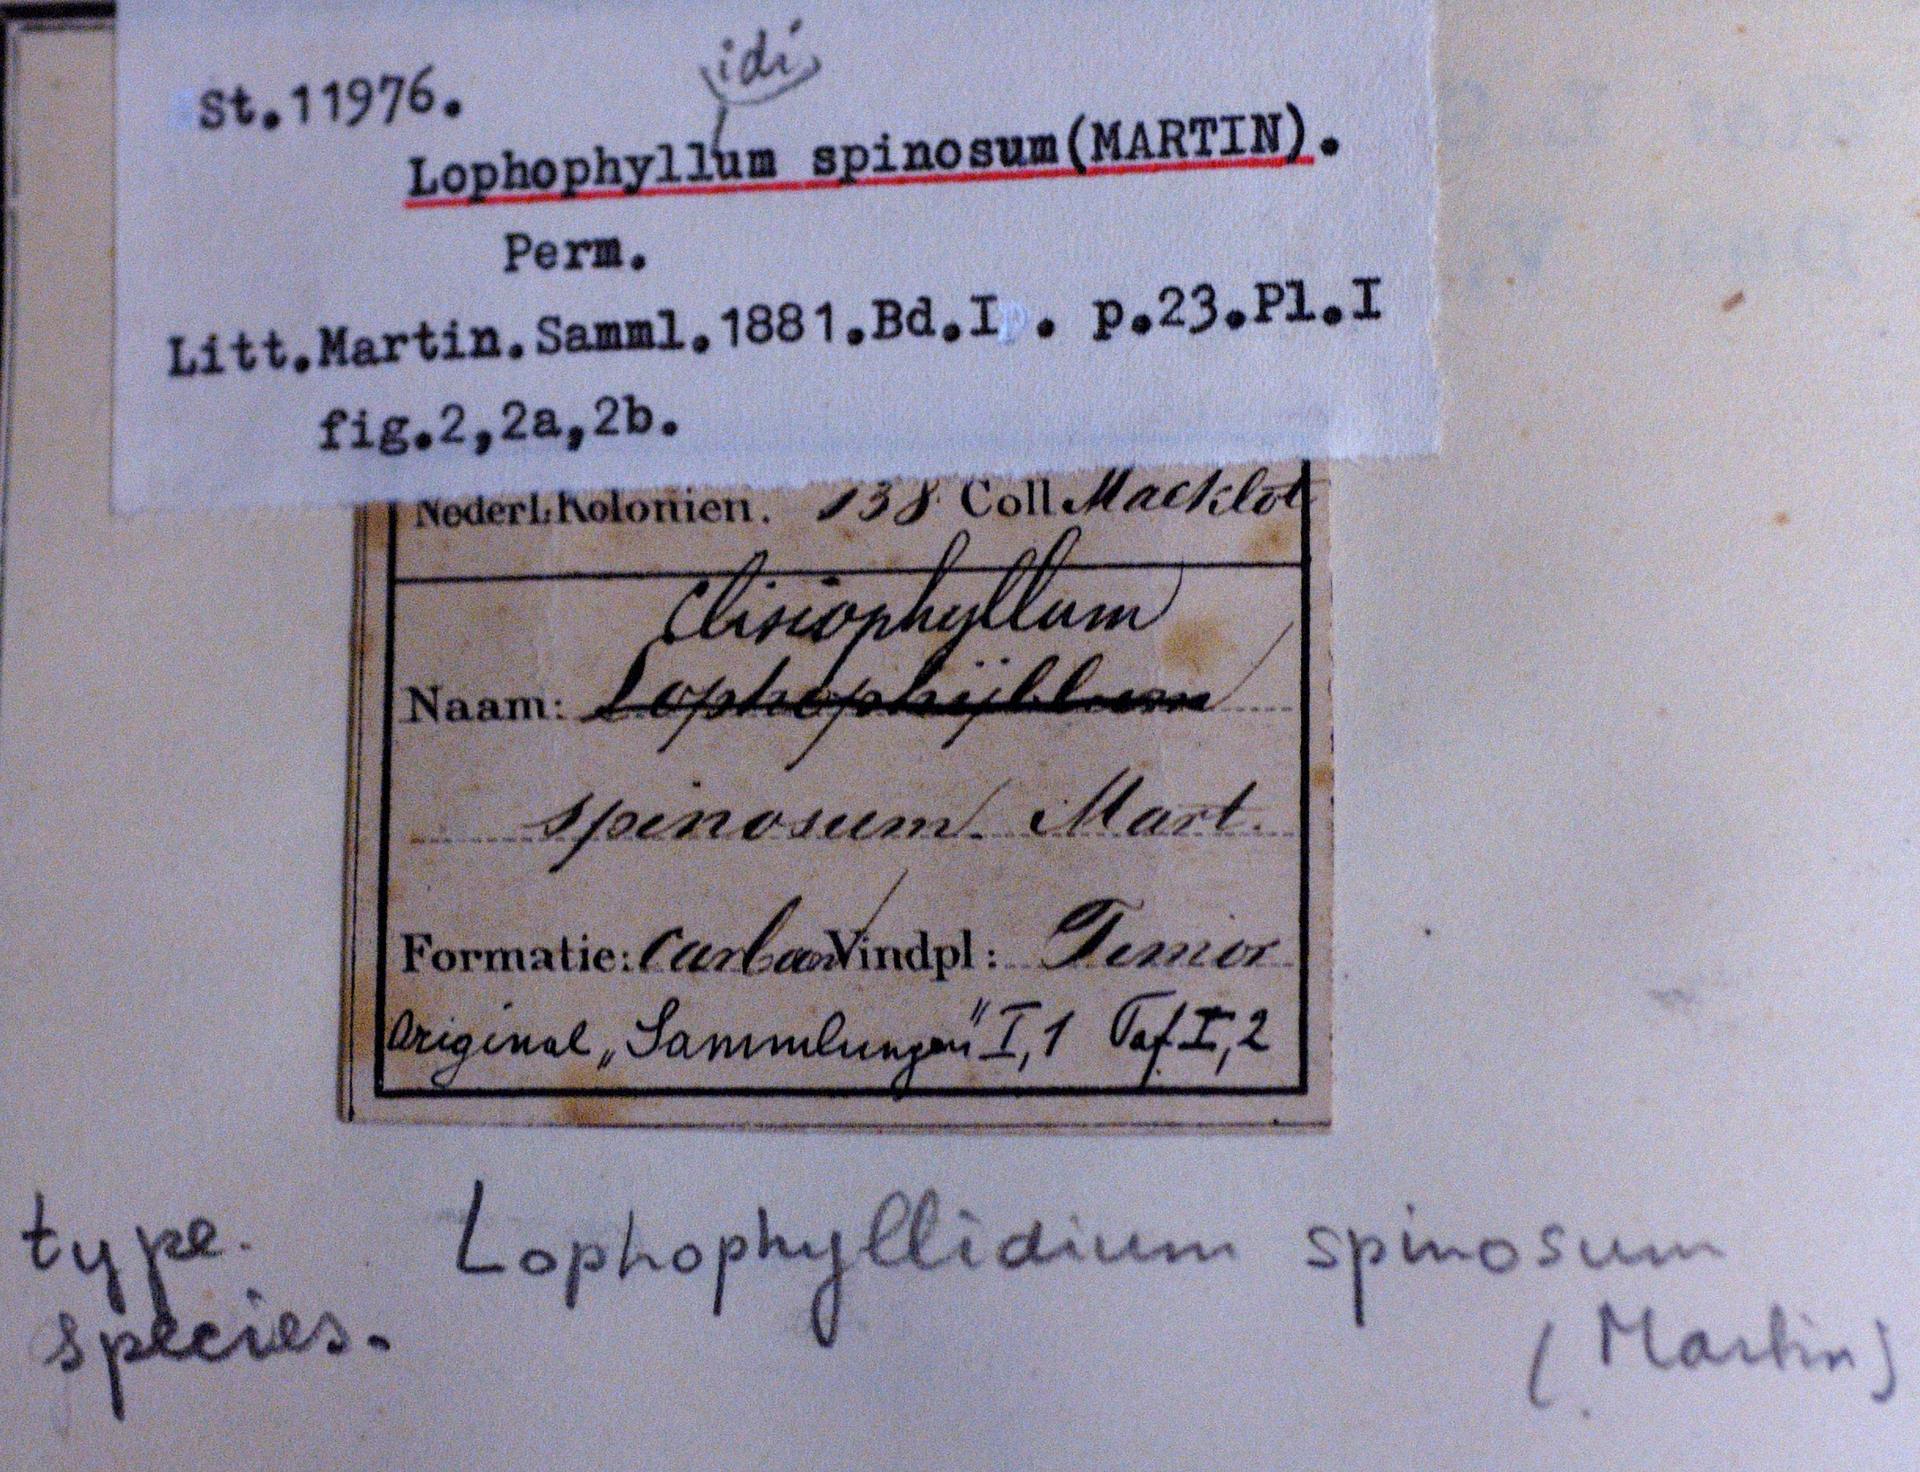 RGM.11976 | Lophophyllidium spinosum (Martin, 1883b)